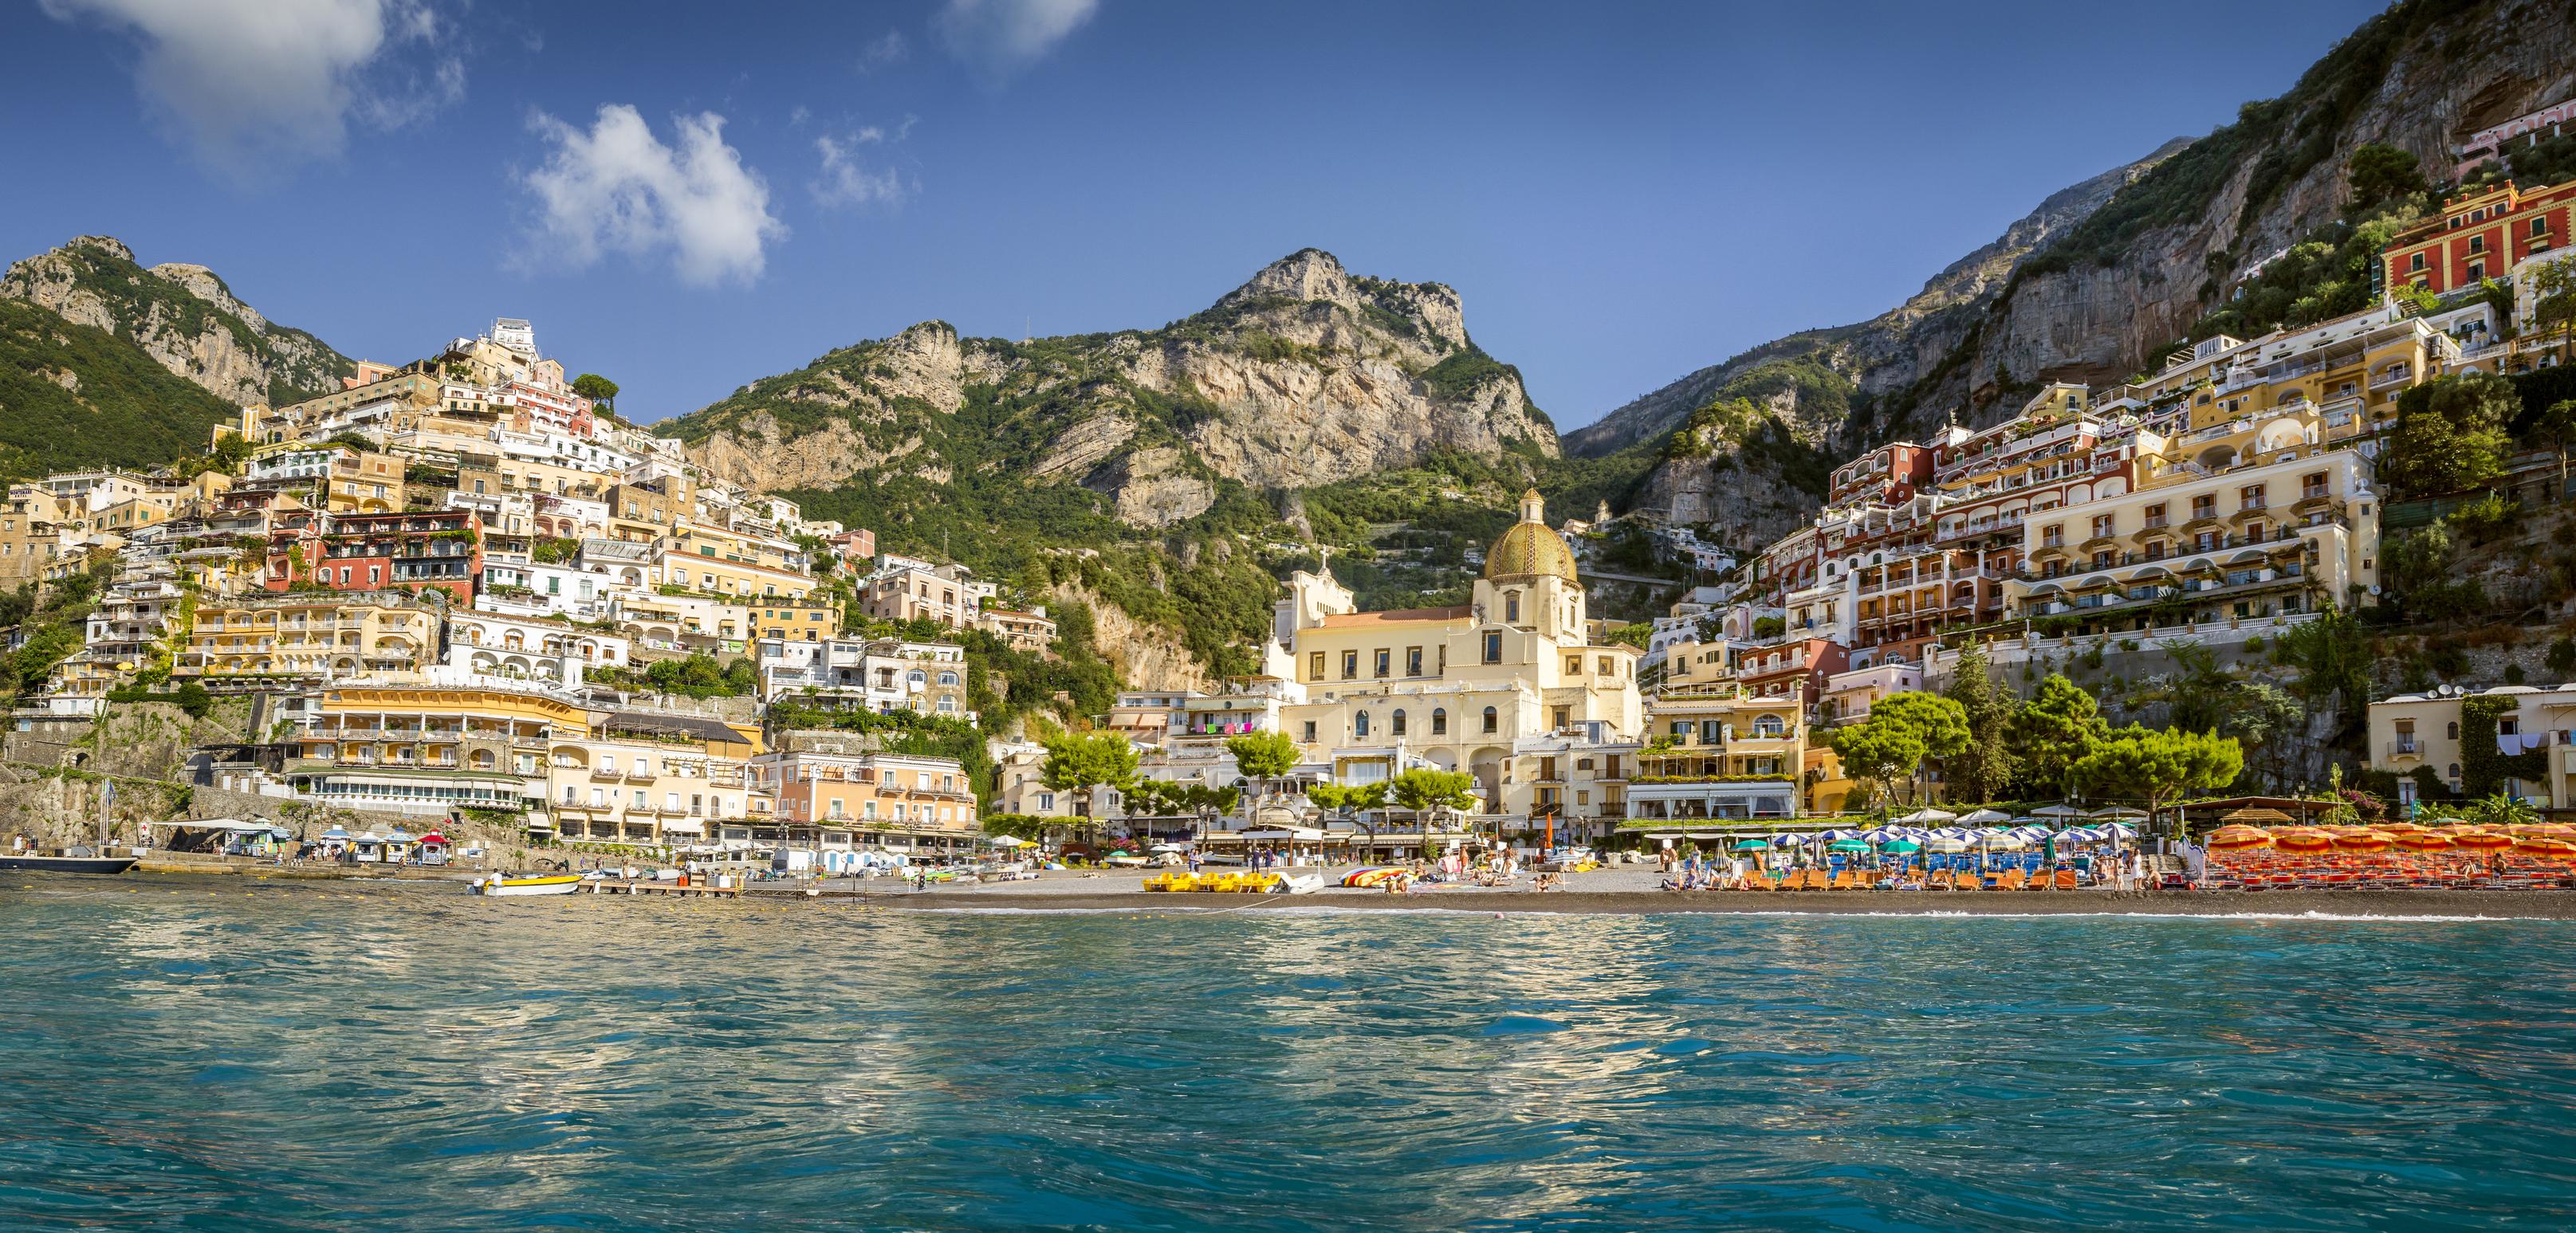 Positano-Italy.jpg?mtime=20190107222134#asset:104379